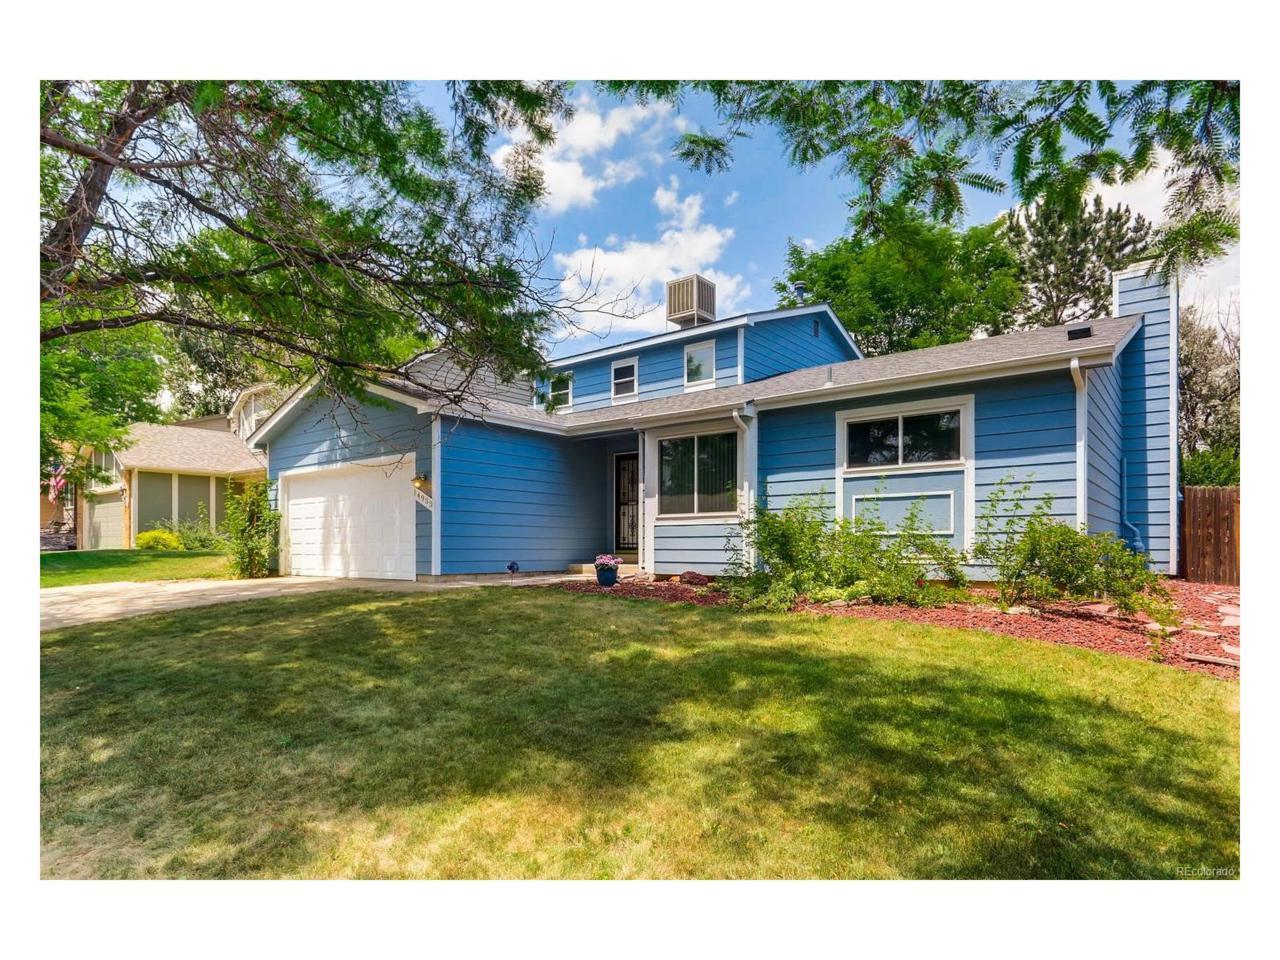 14953 E Asbury Avenue, Aurora, CO 80014 (MLS #2382171) :: 8z Real Estate